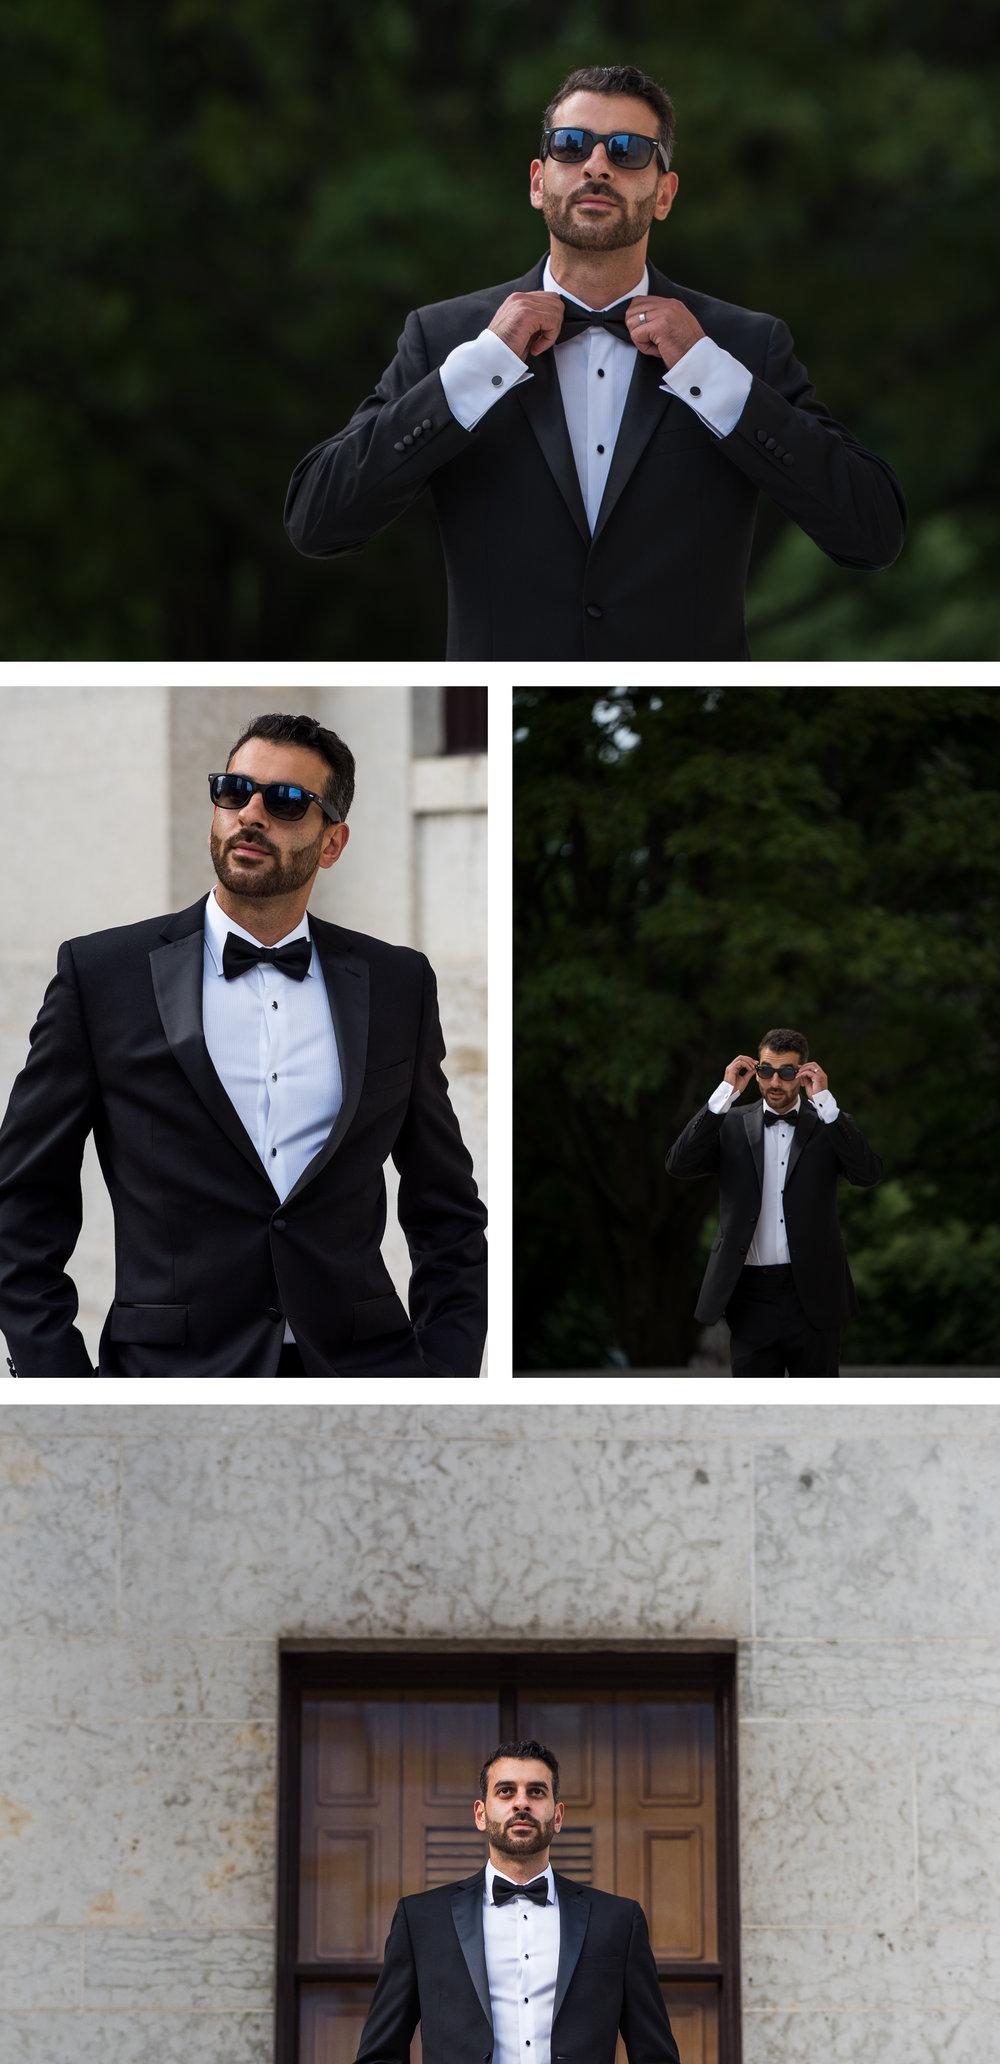 High Fashion Groom Portrait at the Ohio StateHouse. Brett Loves Elle Photography, Columbus Wedding Photographers.